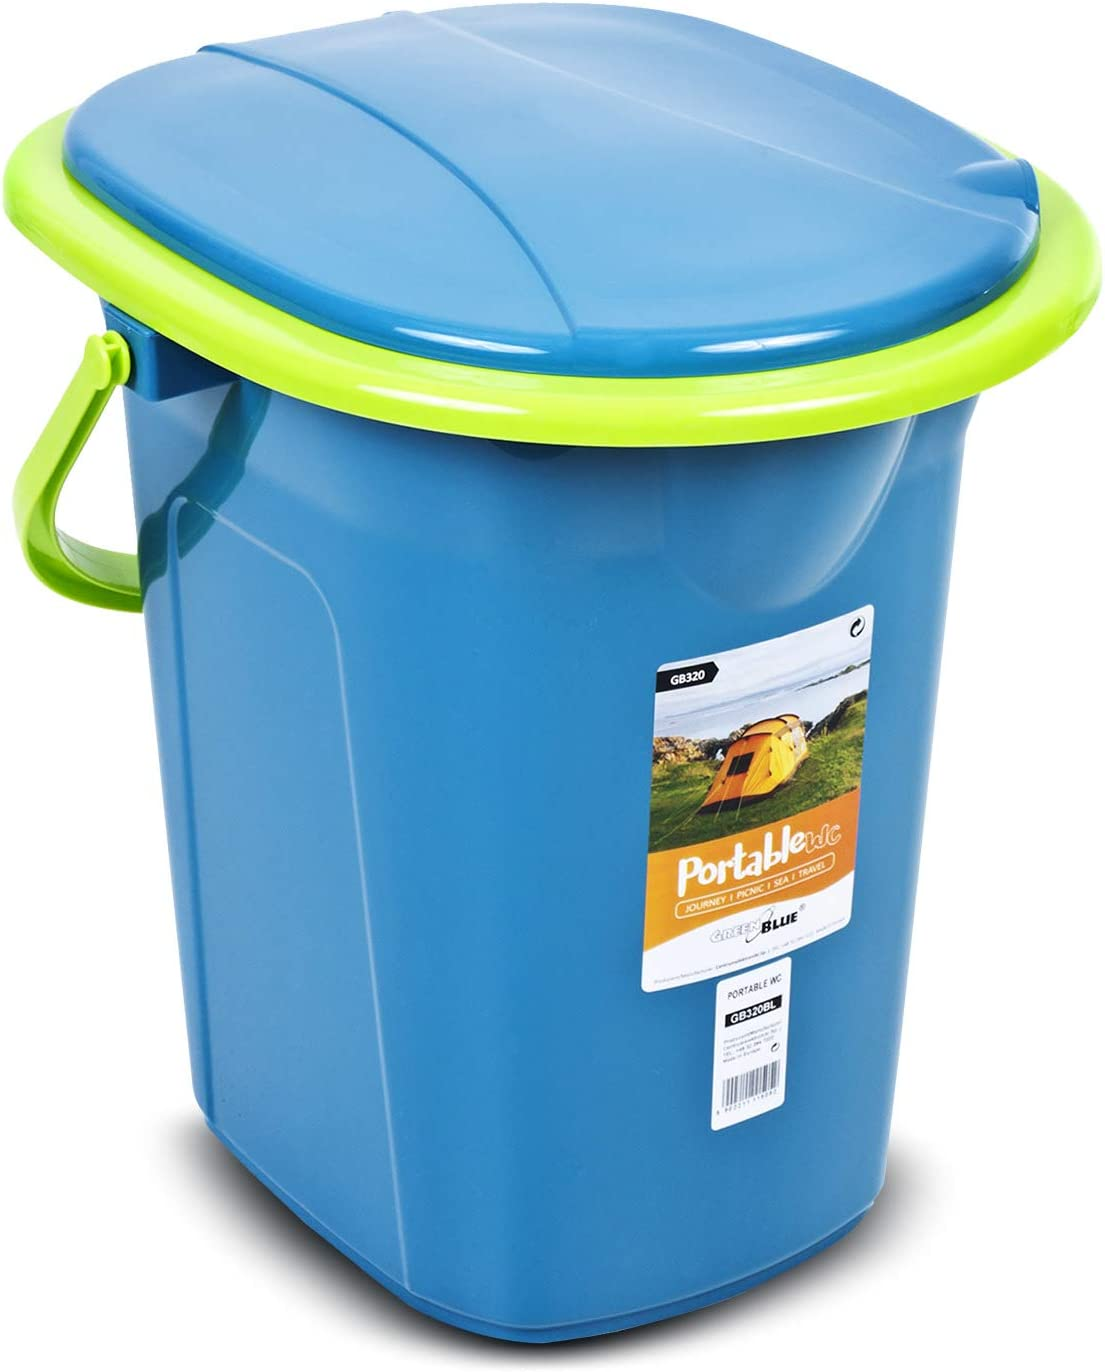 Green Blue GB320 Portable Toilet 19L